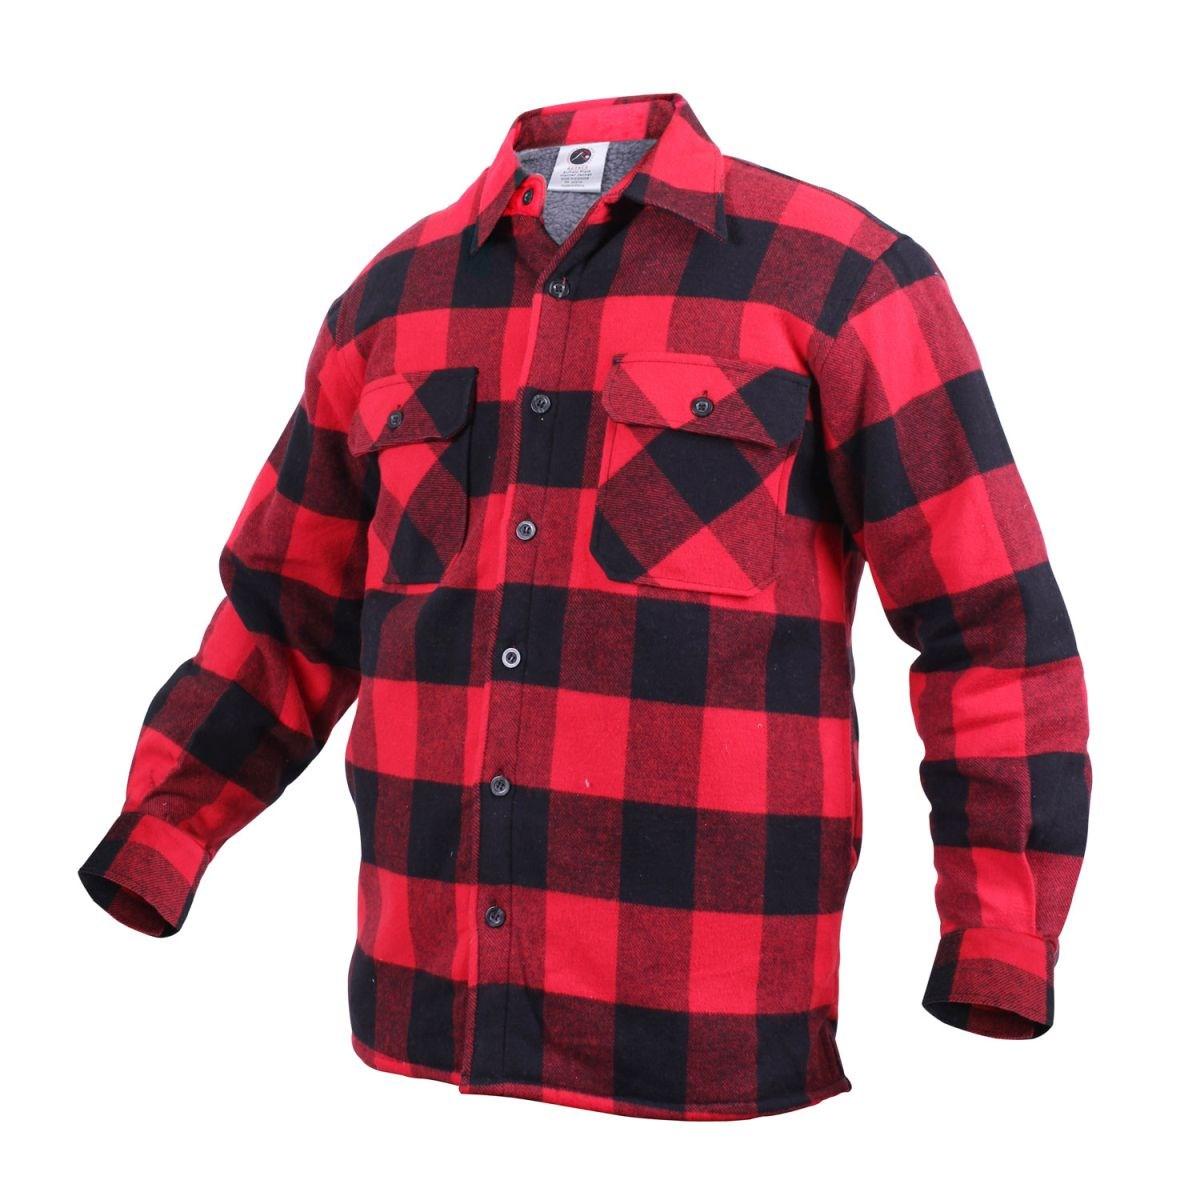 Košile dřevorubecká zateplená kostkovaná ČERVENÁ ROTHCO 3739RED L-11